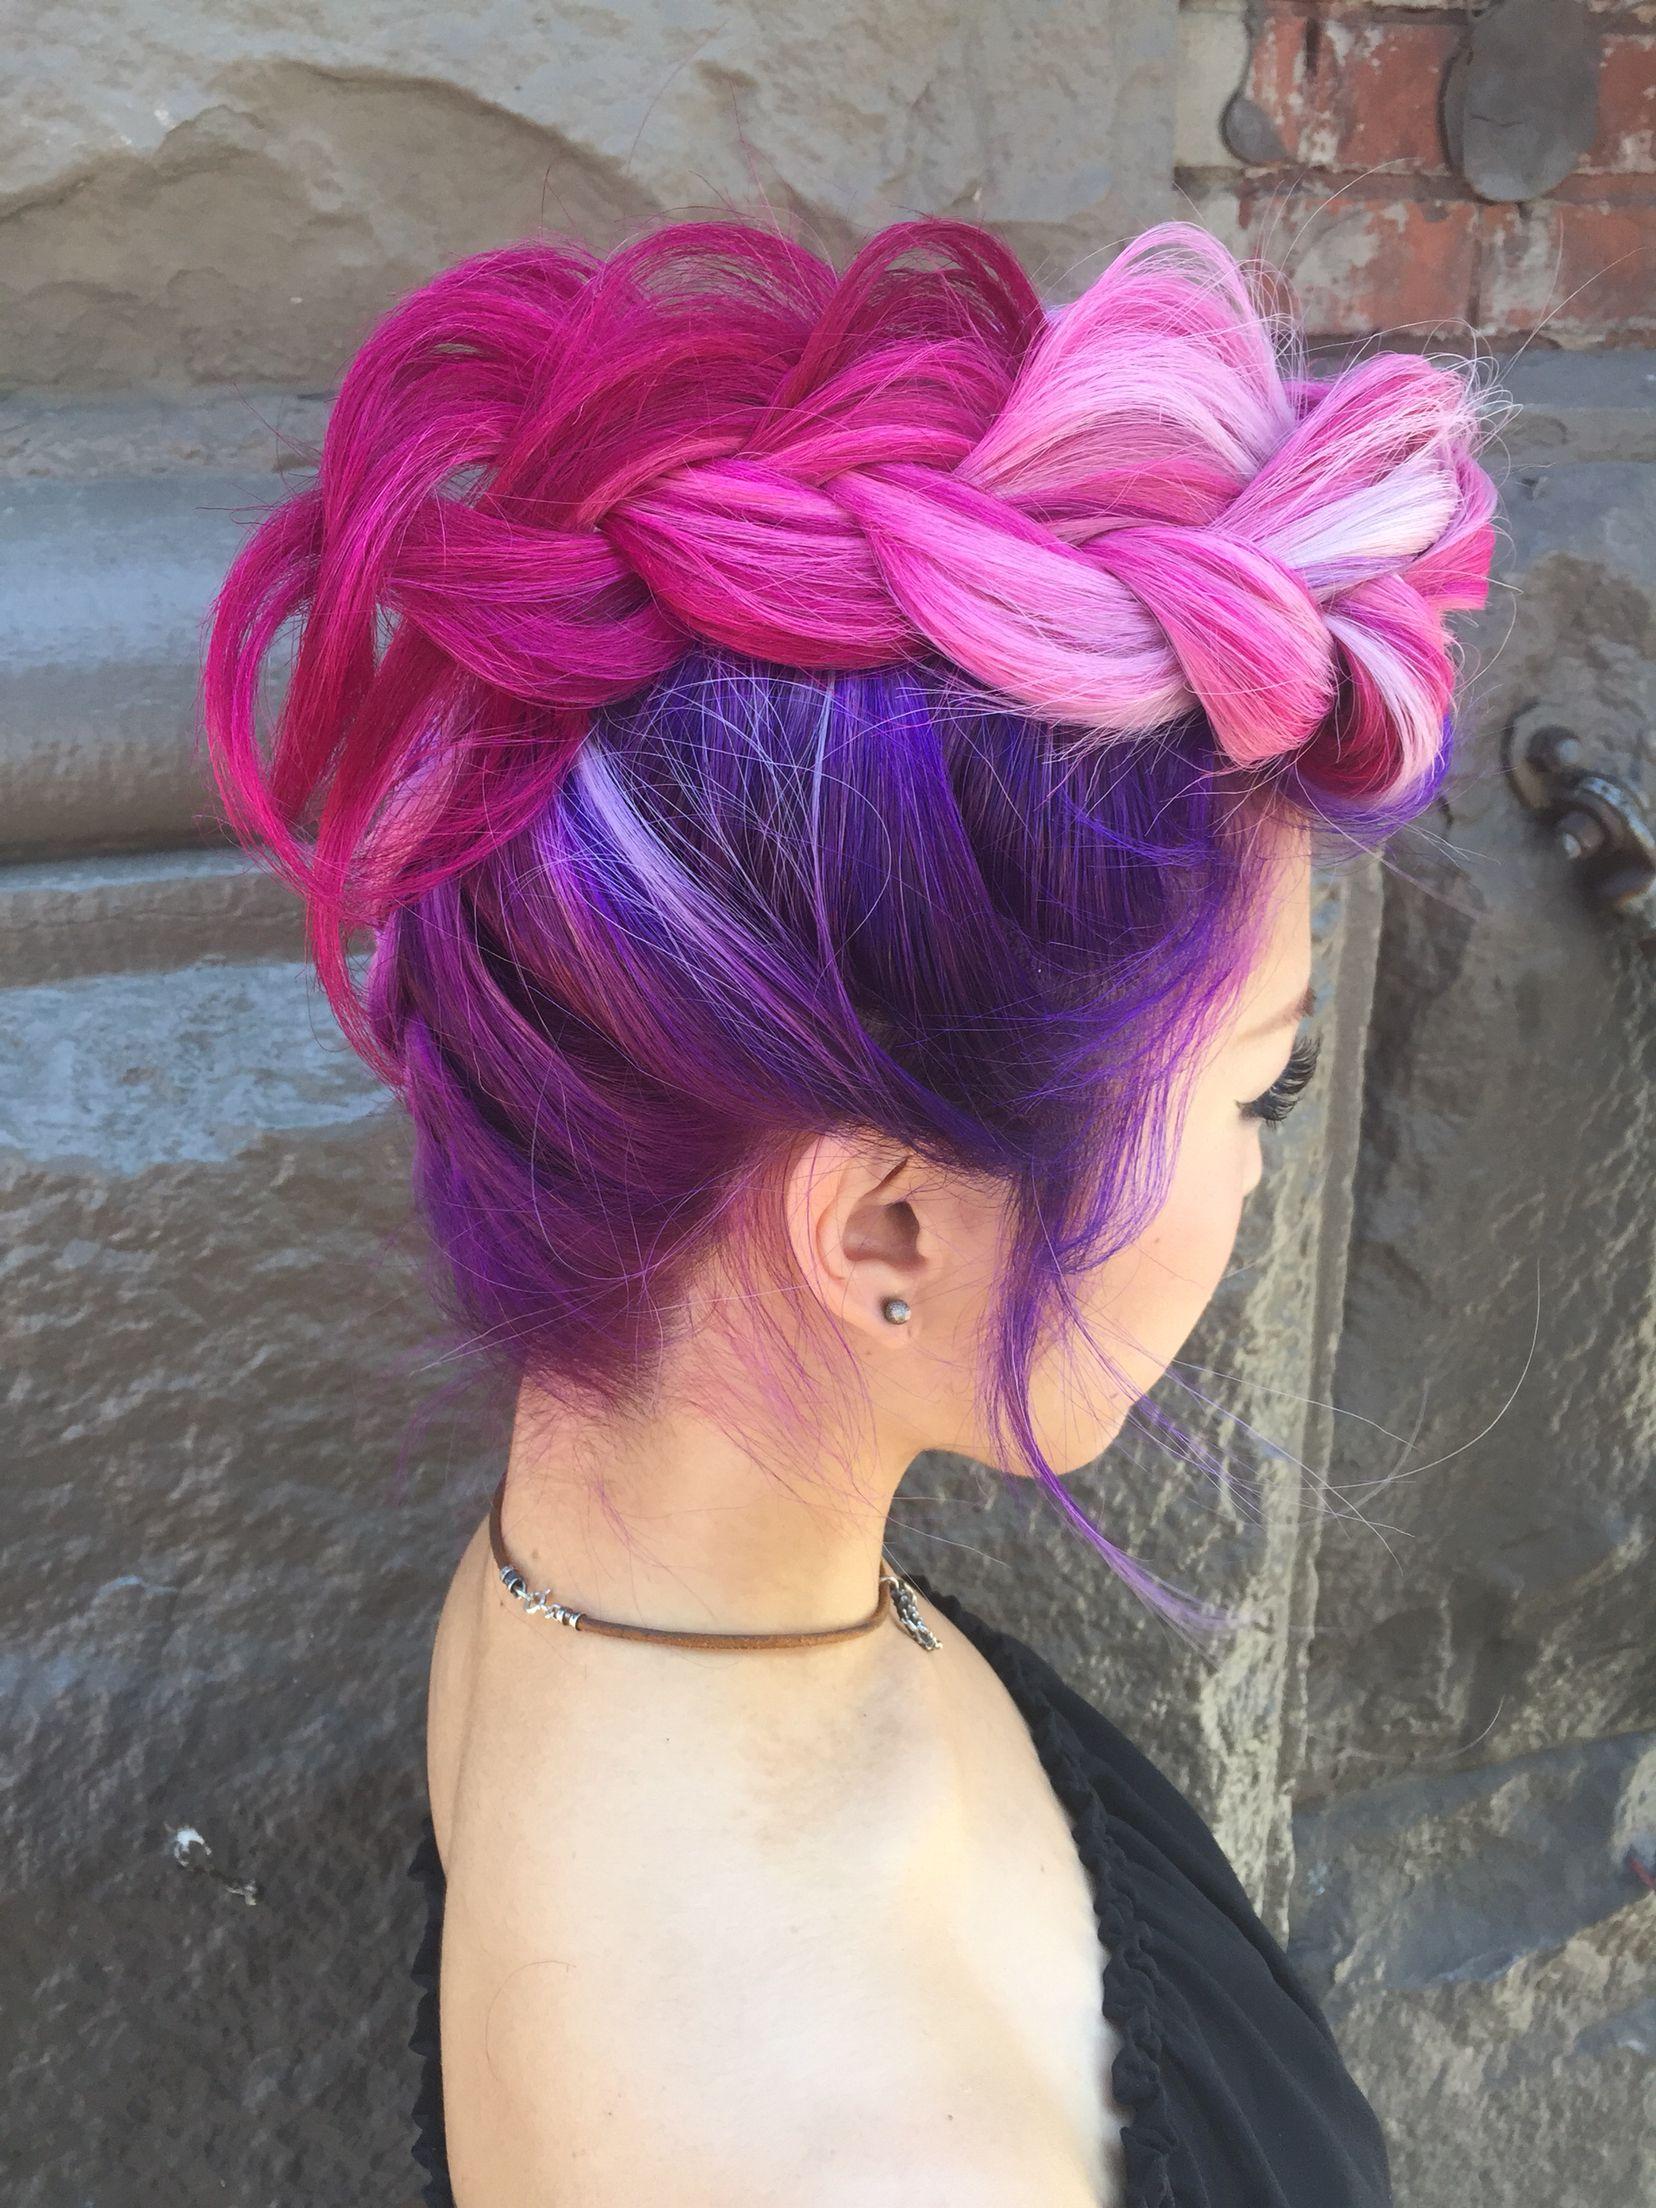 Hot pink braided mohawk by me heatherchapmanhair snapchat